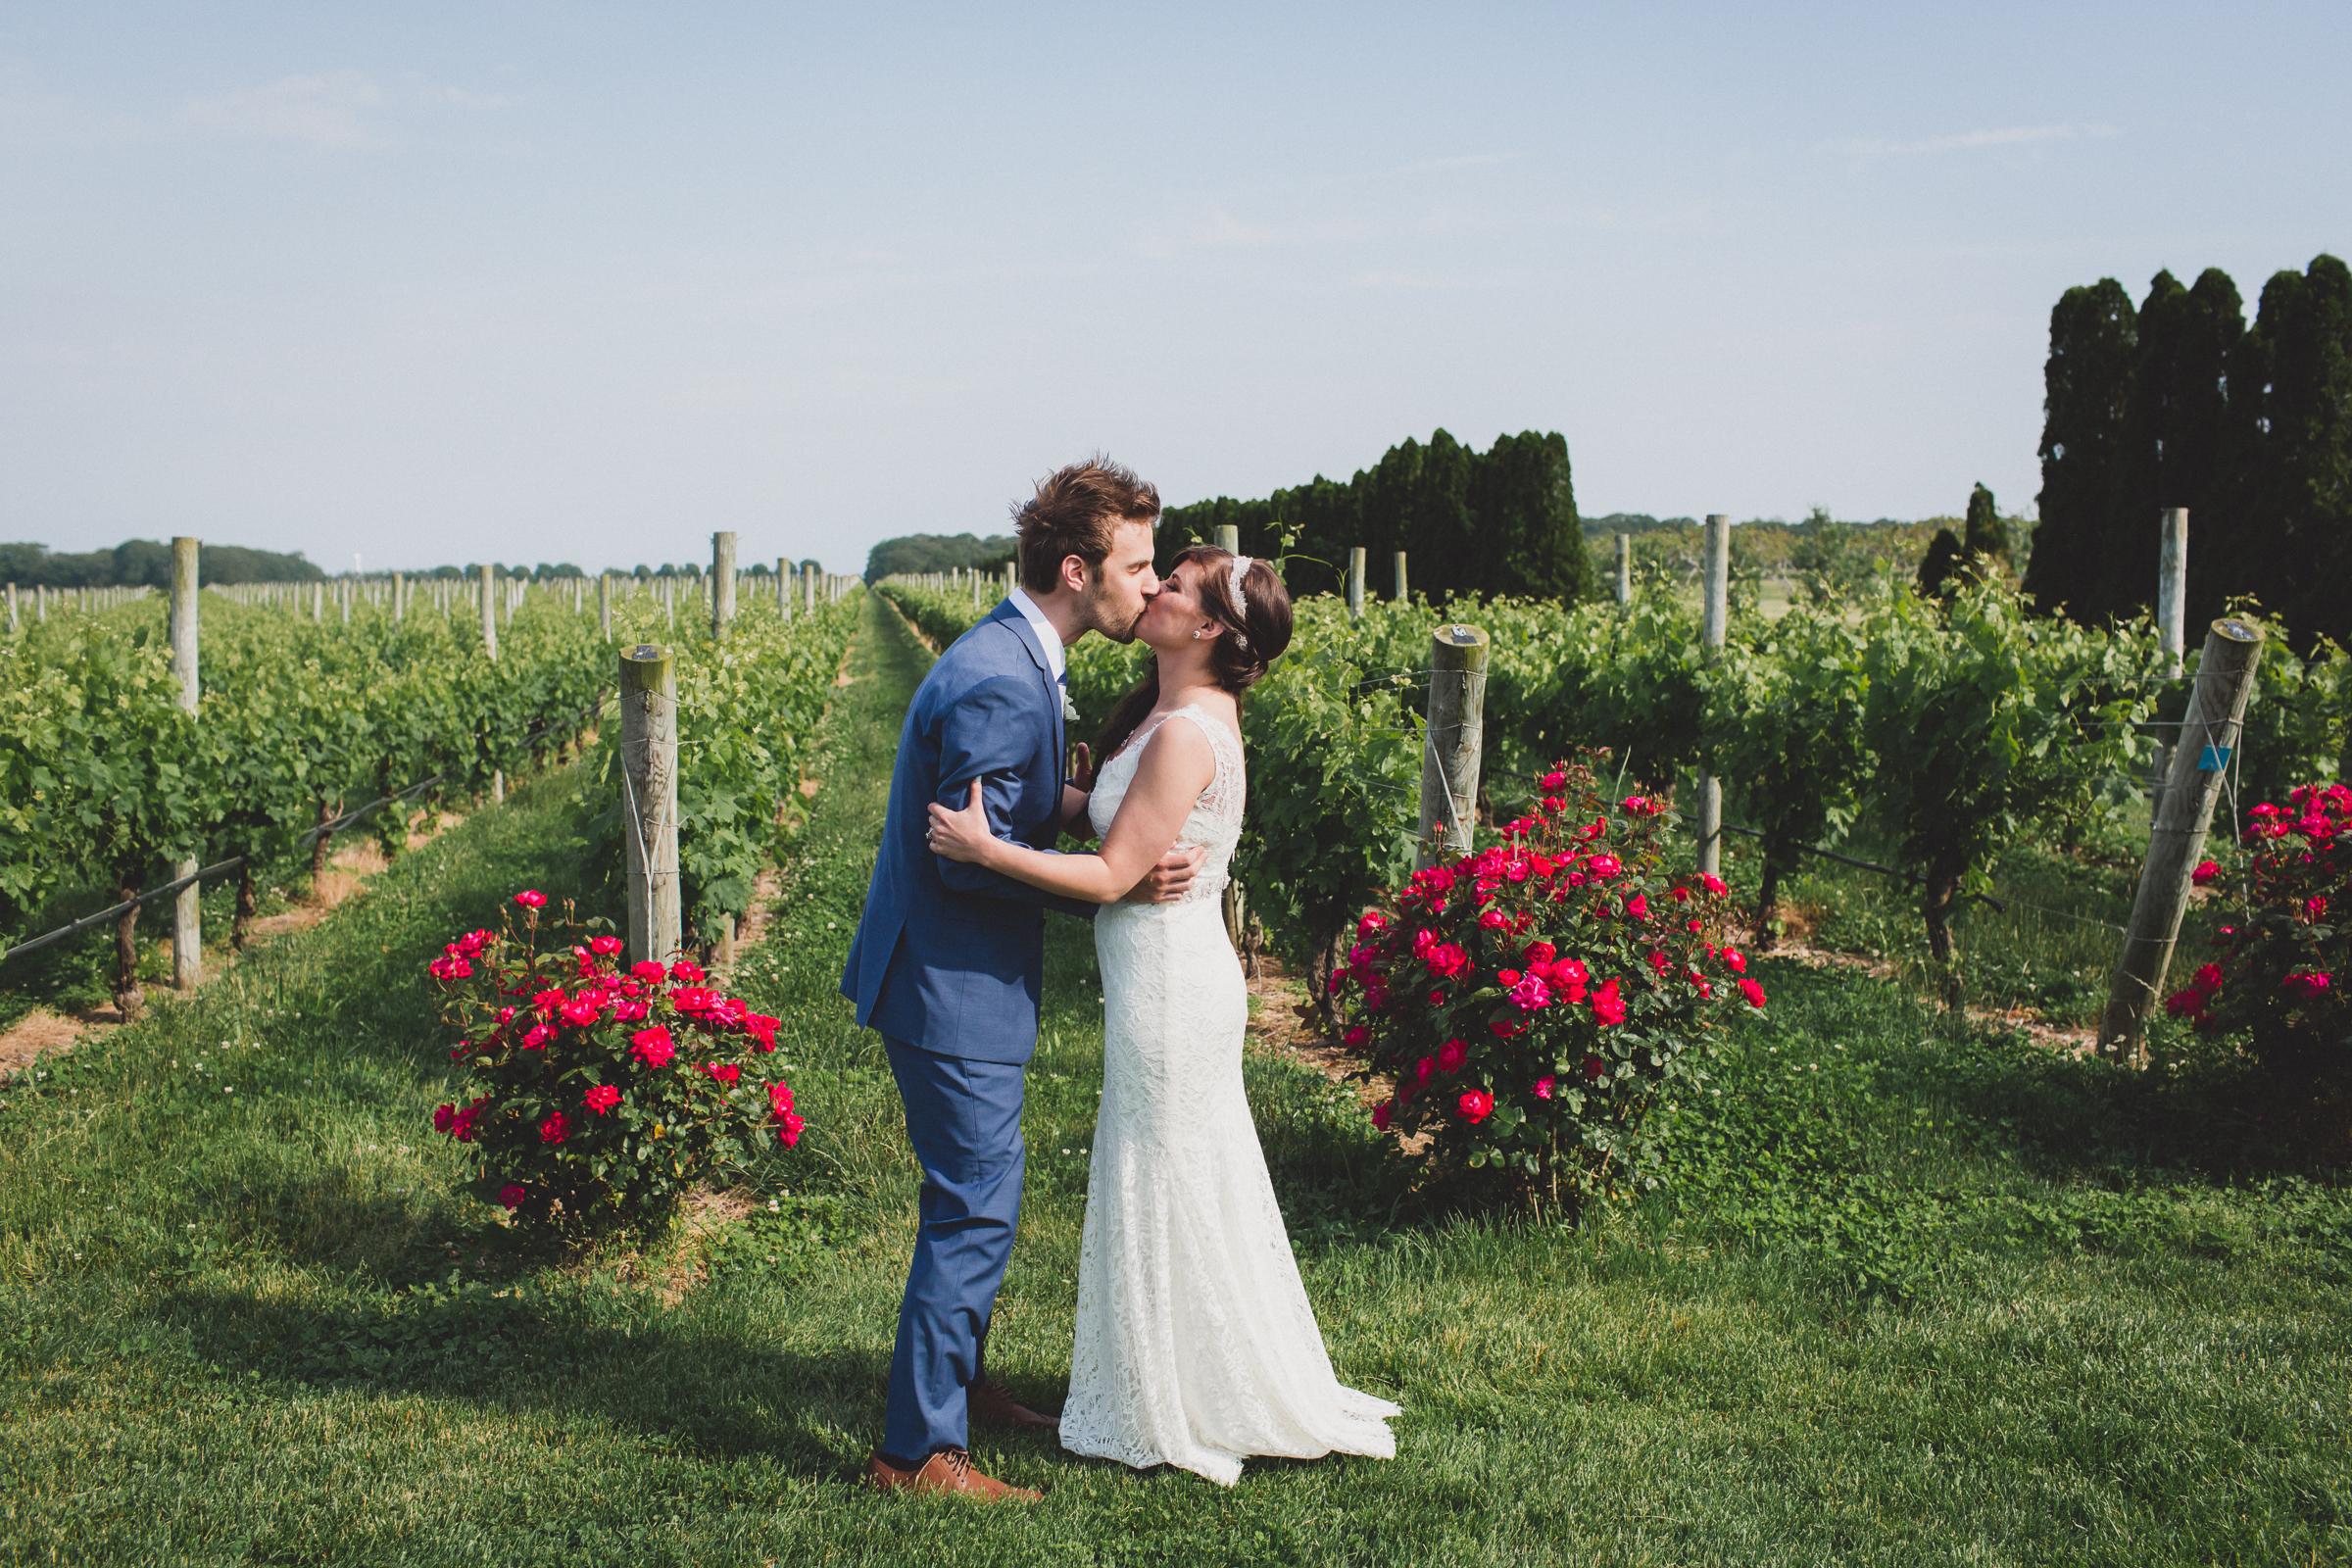 Martha-Clara-Vineyard-Long-Island-Documentary-Wedding-Photographer-27.jpg